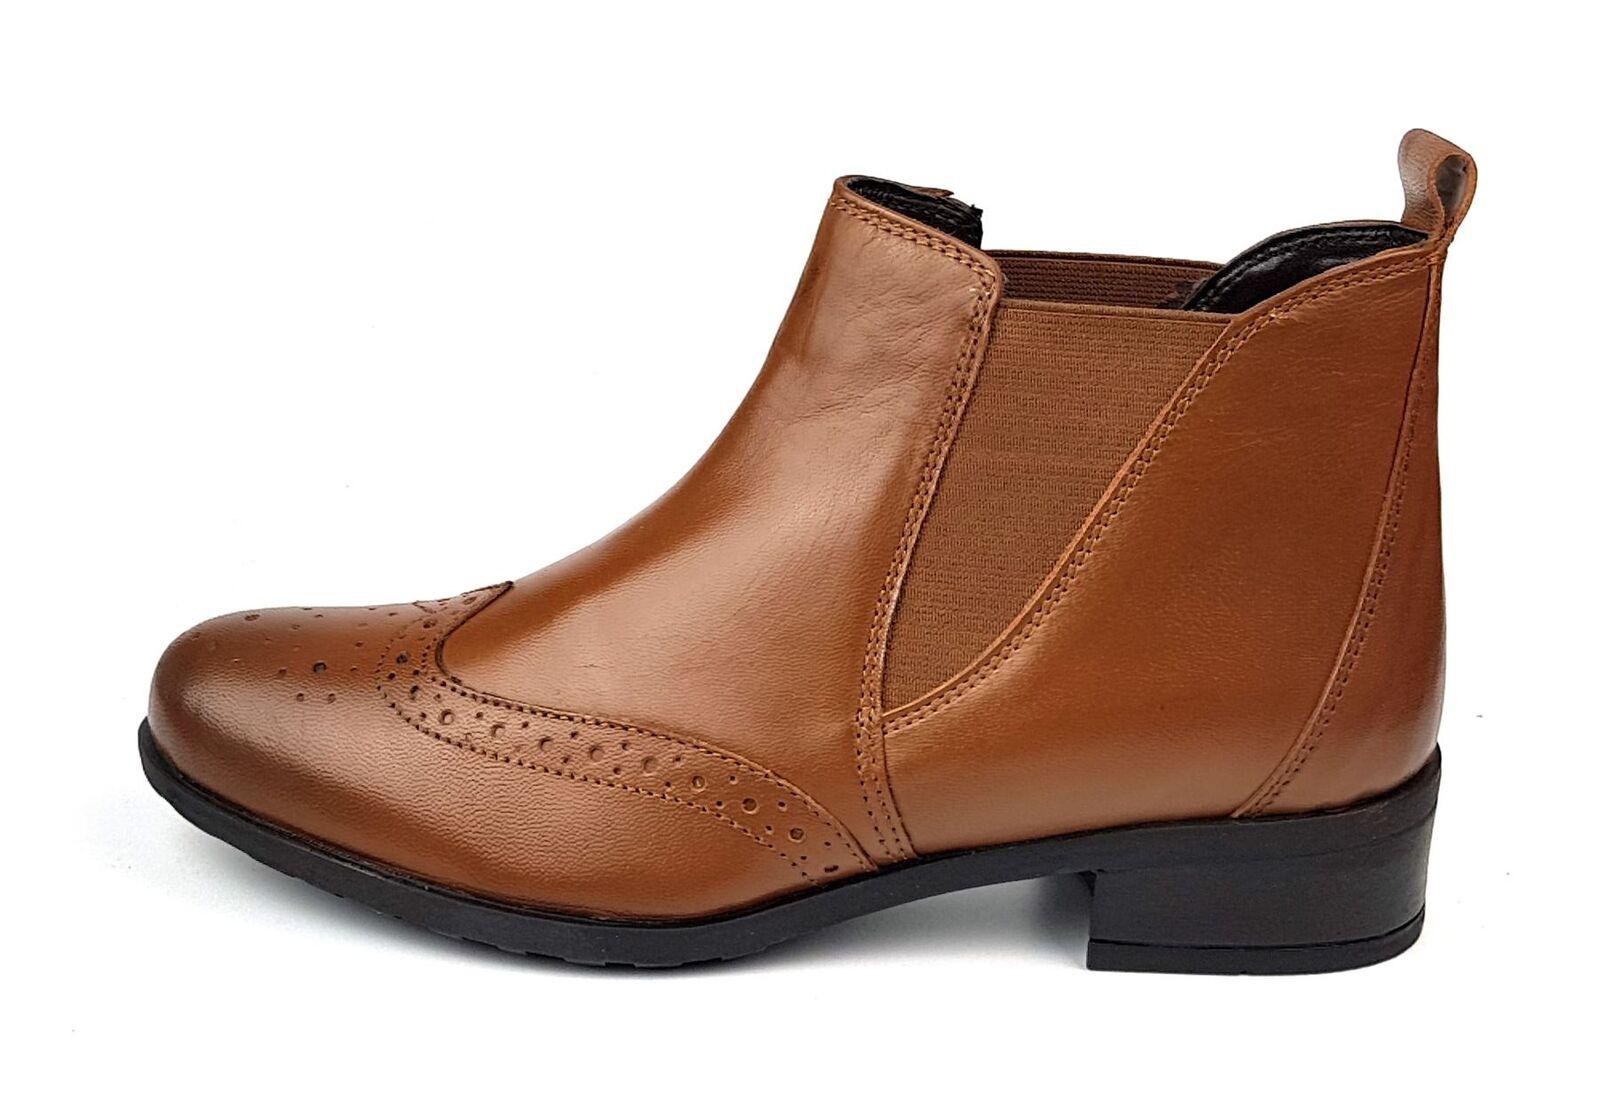 Comfort Plus Ladies Womans Leather Chelsea Boots Tan 3 4 5 6 7 8 1